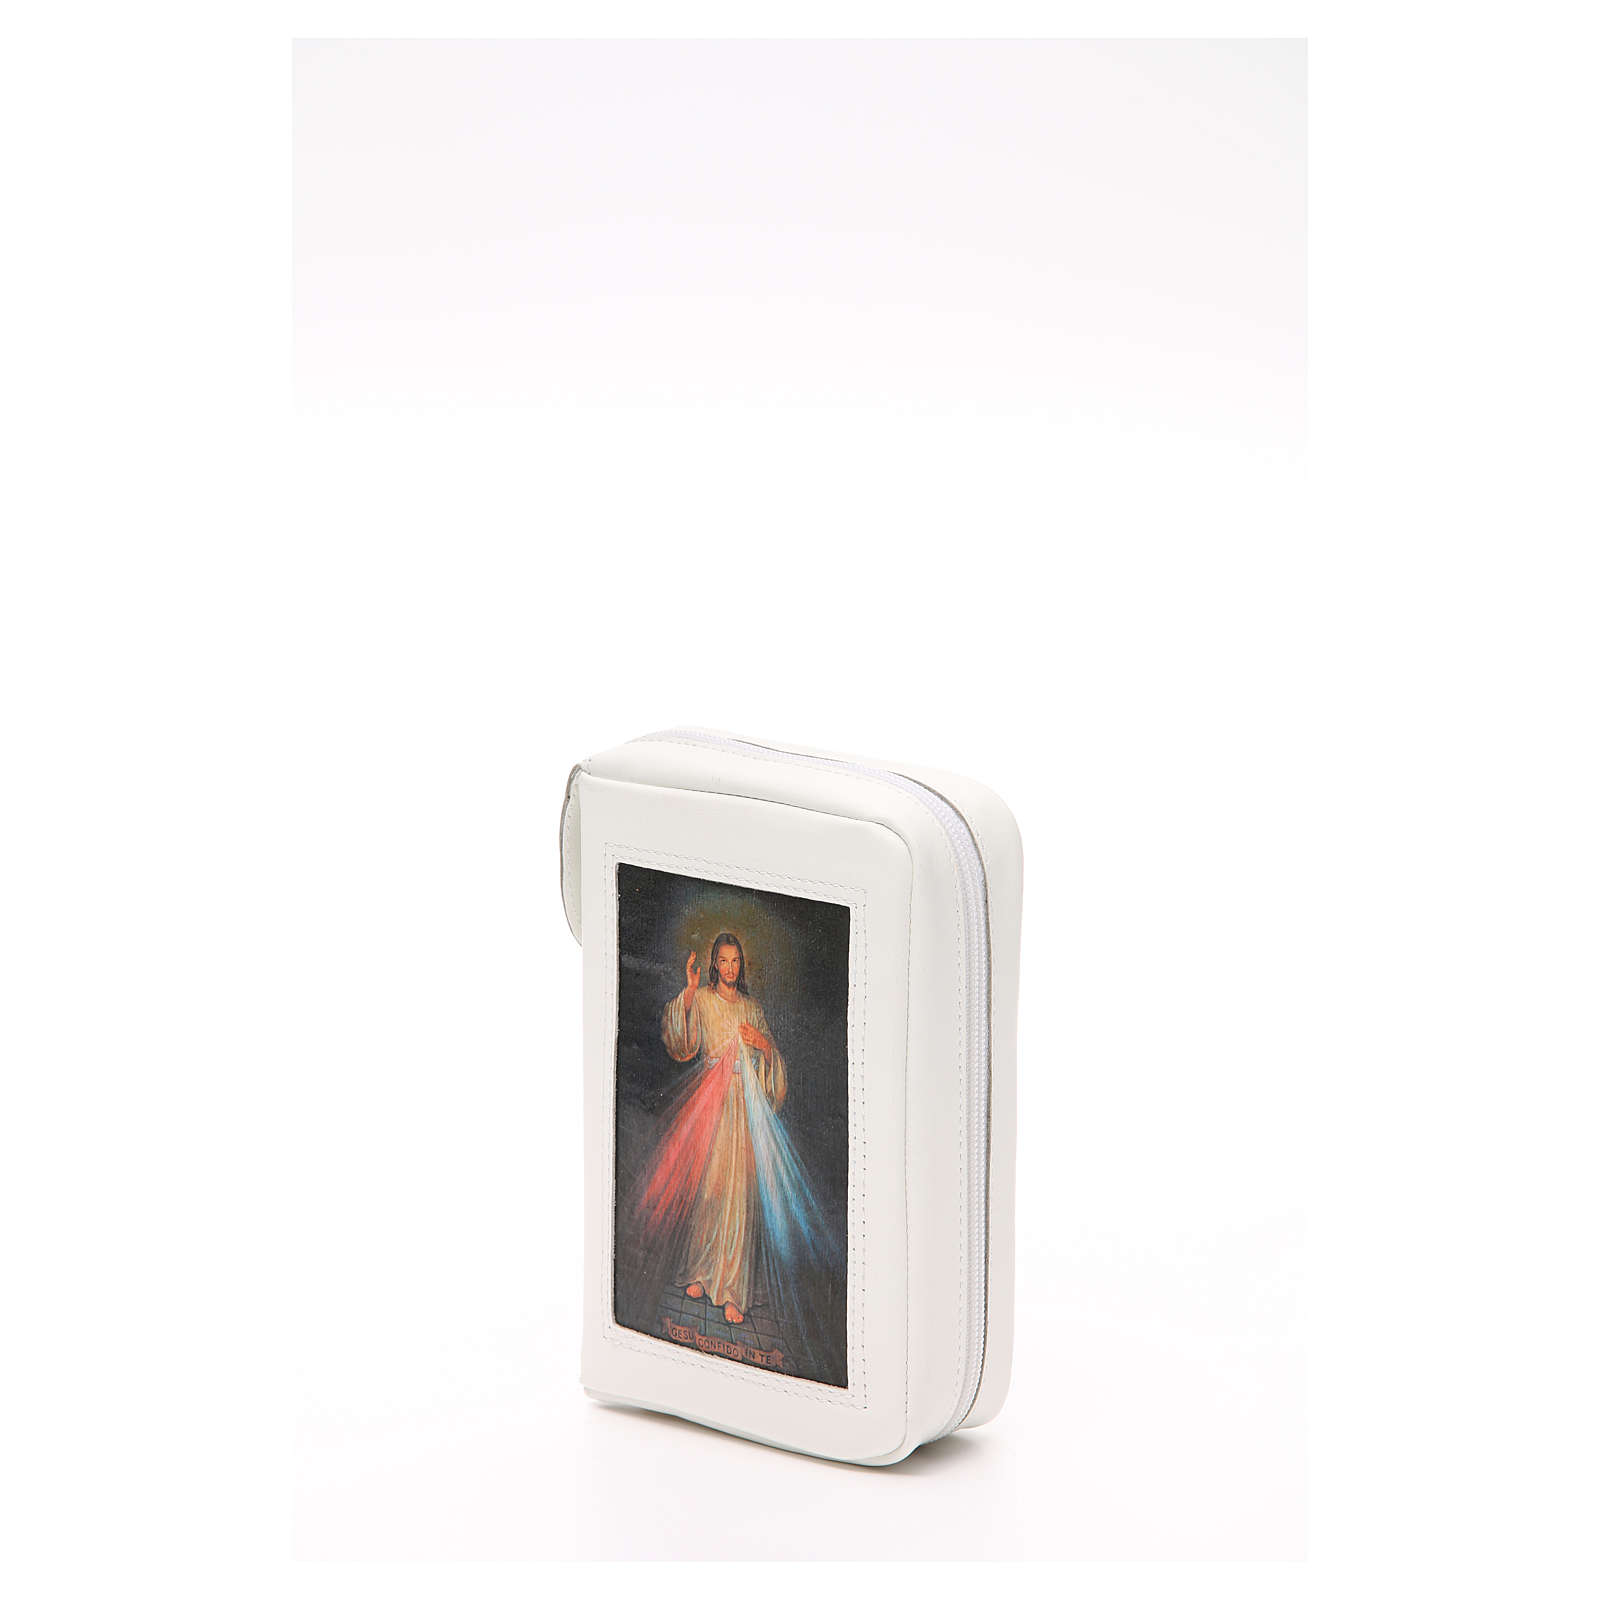 Capa Liturgia das Horas Branca em Couro Natural Jesus Misericordioso fecho de correr 4